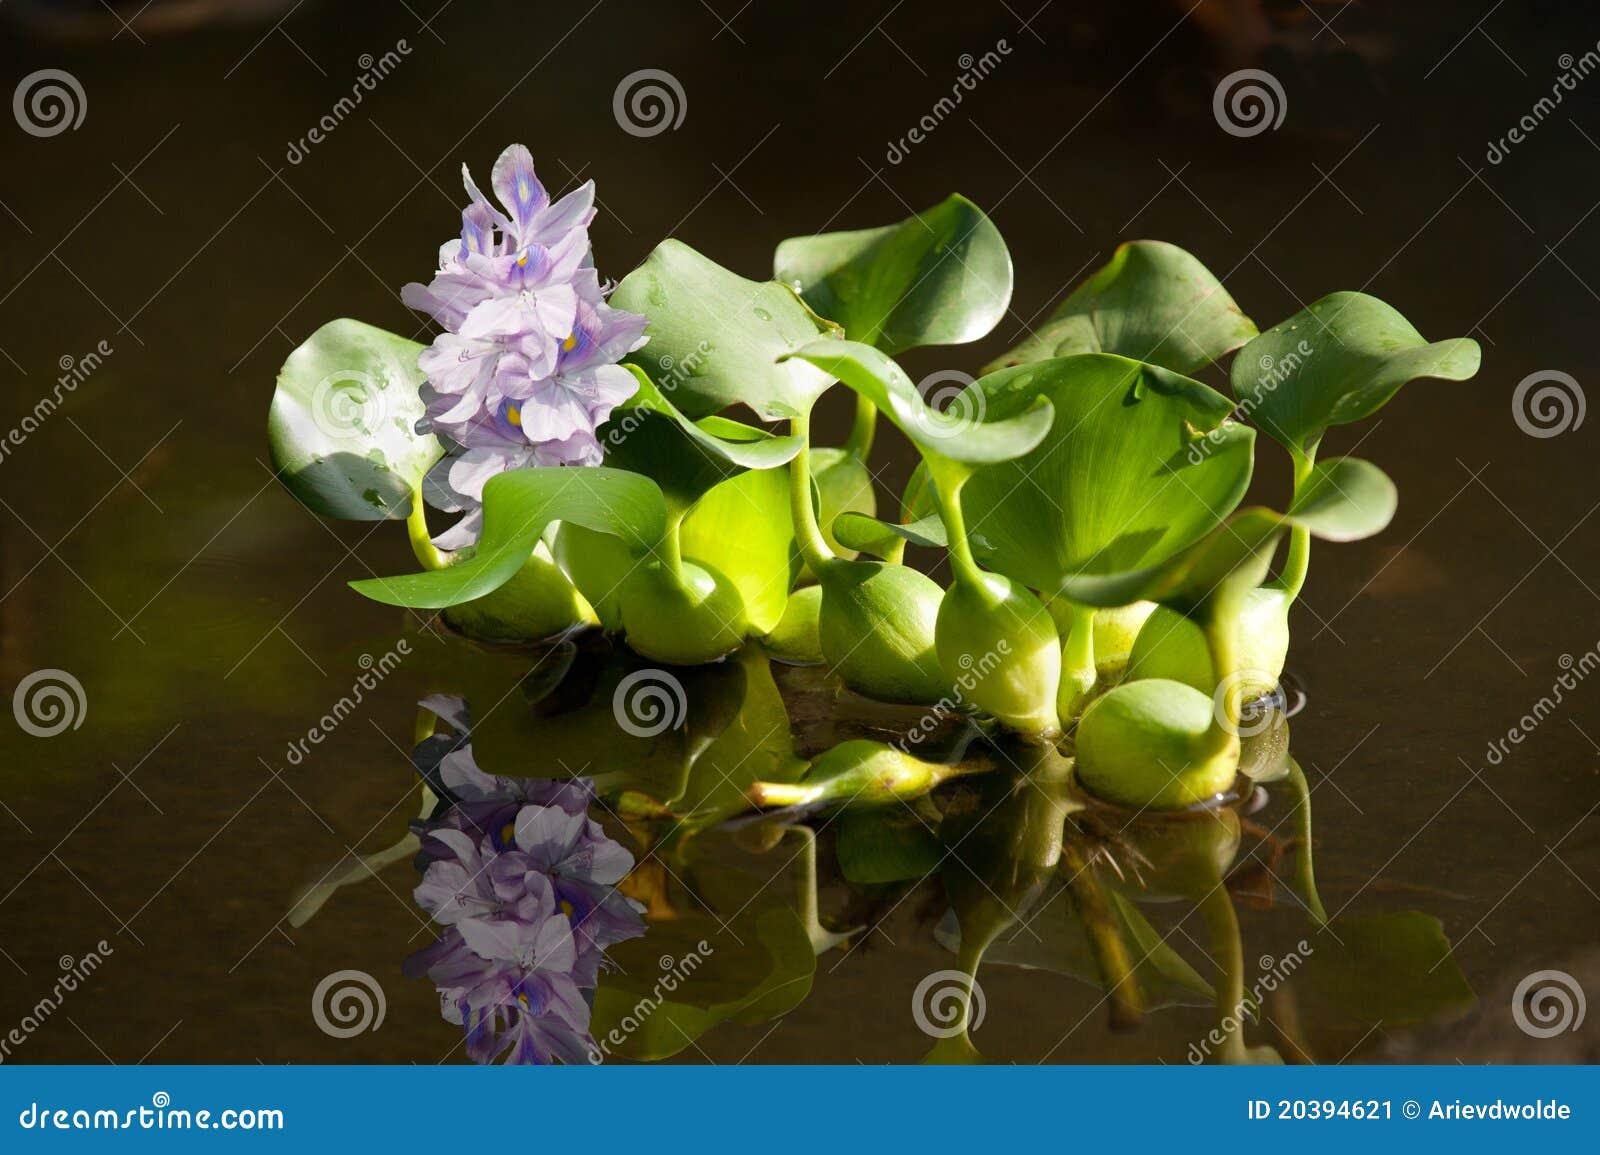 Floating water hyacinth